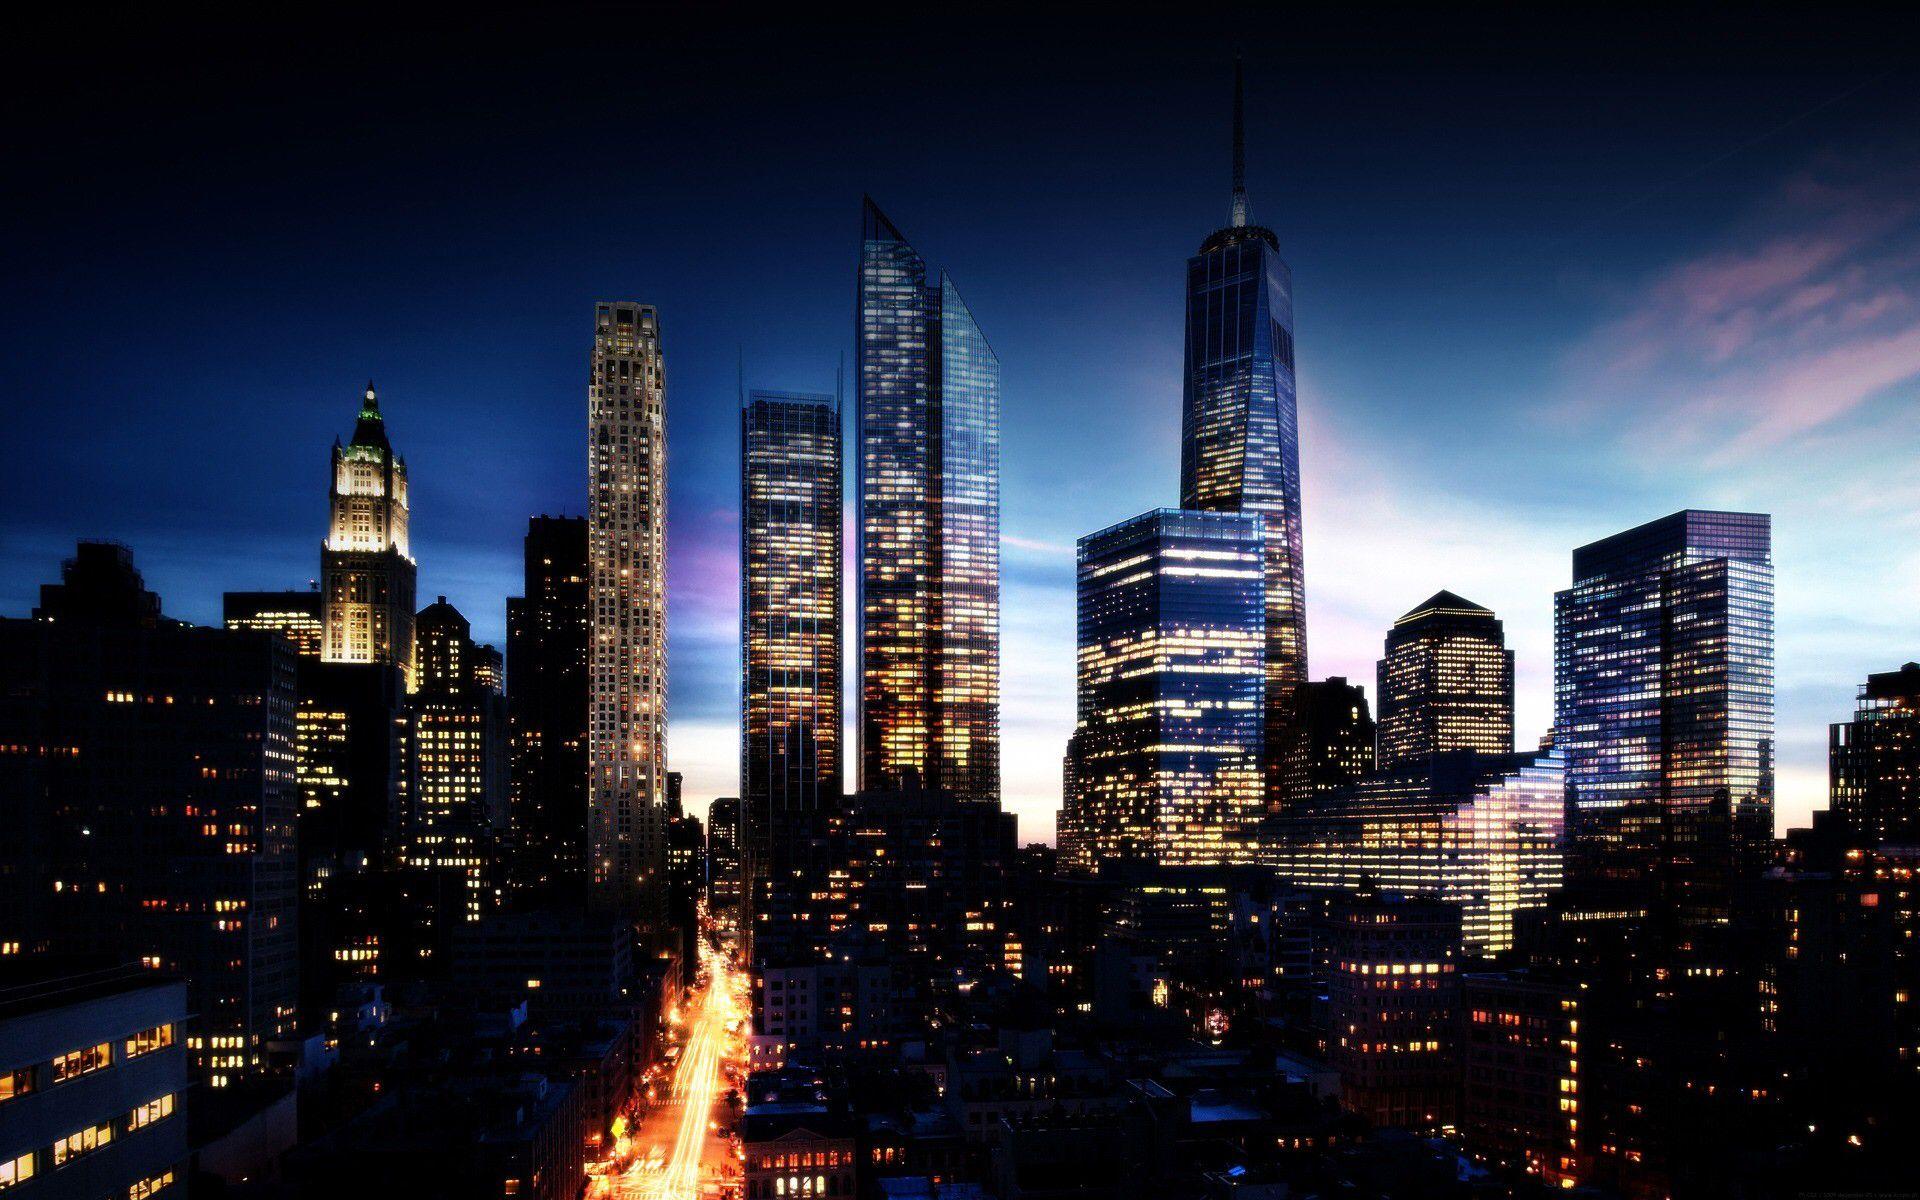 Image from http://www.wallmu.com/popular/wallstock/cityscapes-skylines-night-fresh-new-hd-wallpaper.jpg.